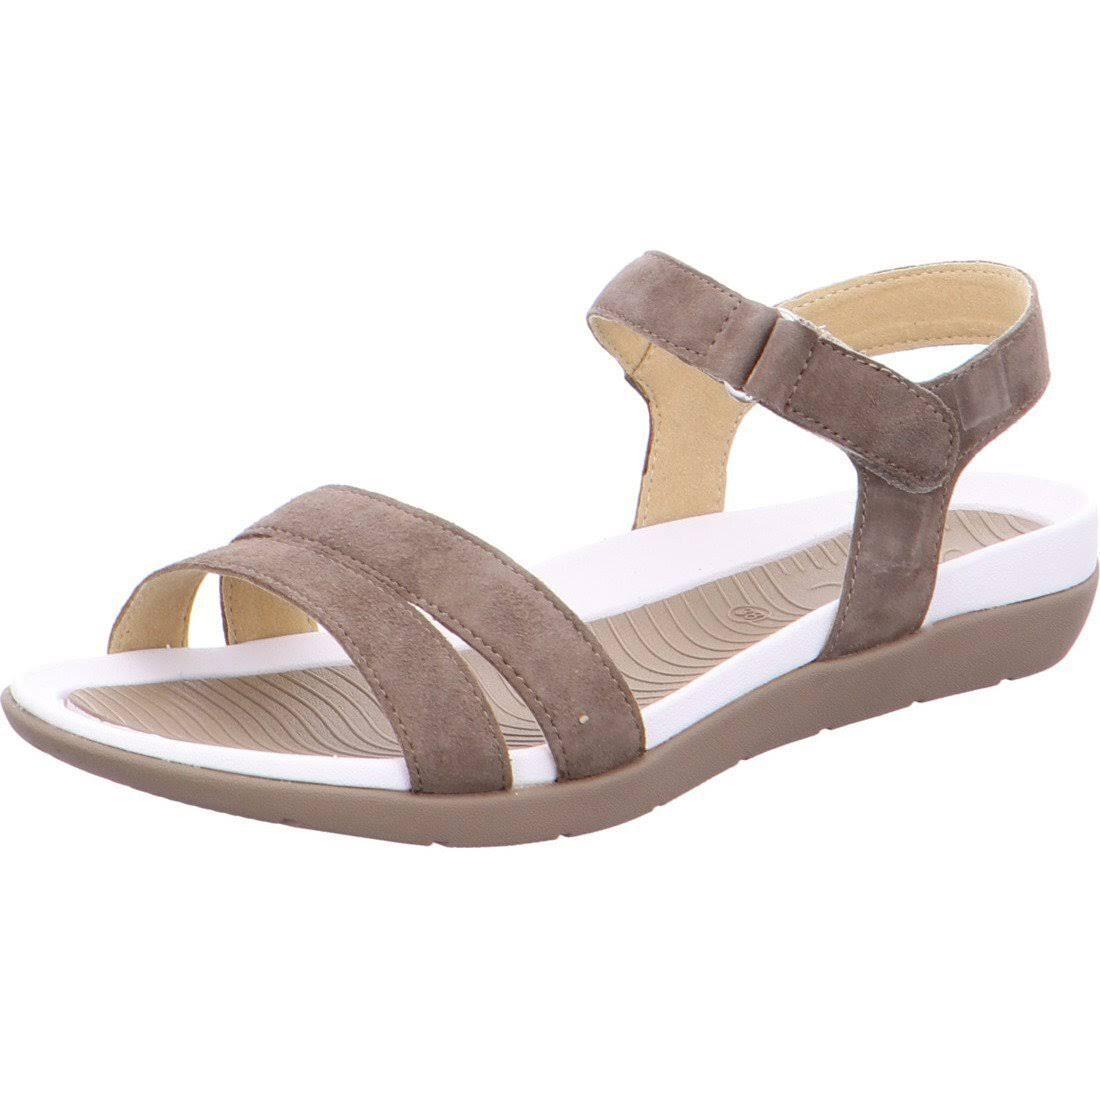 (6 UK / 39 EU) Ara Women's Brown Nepal Sandals